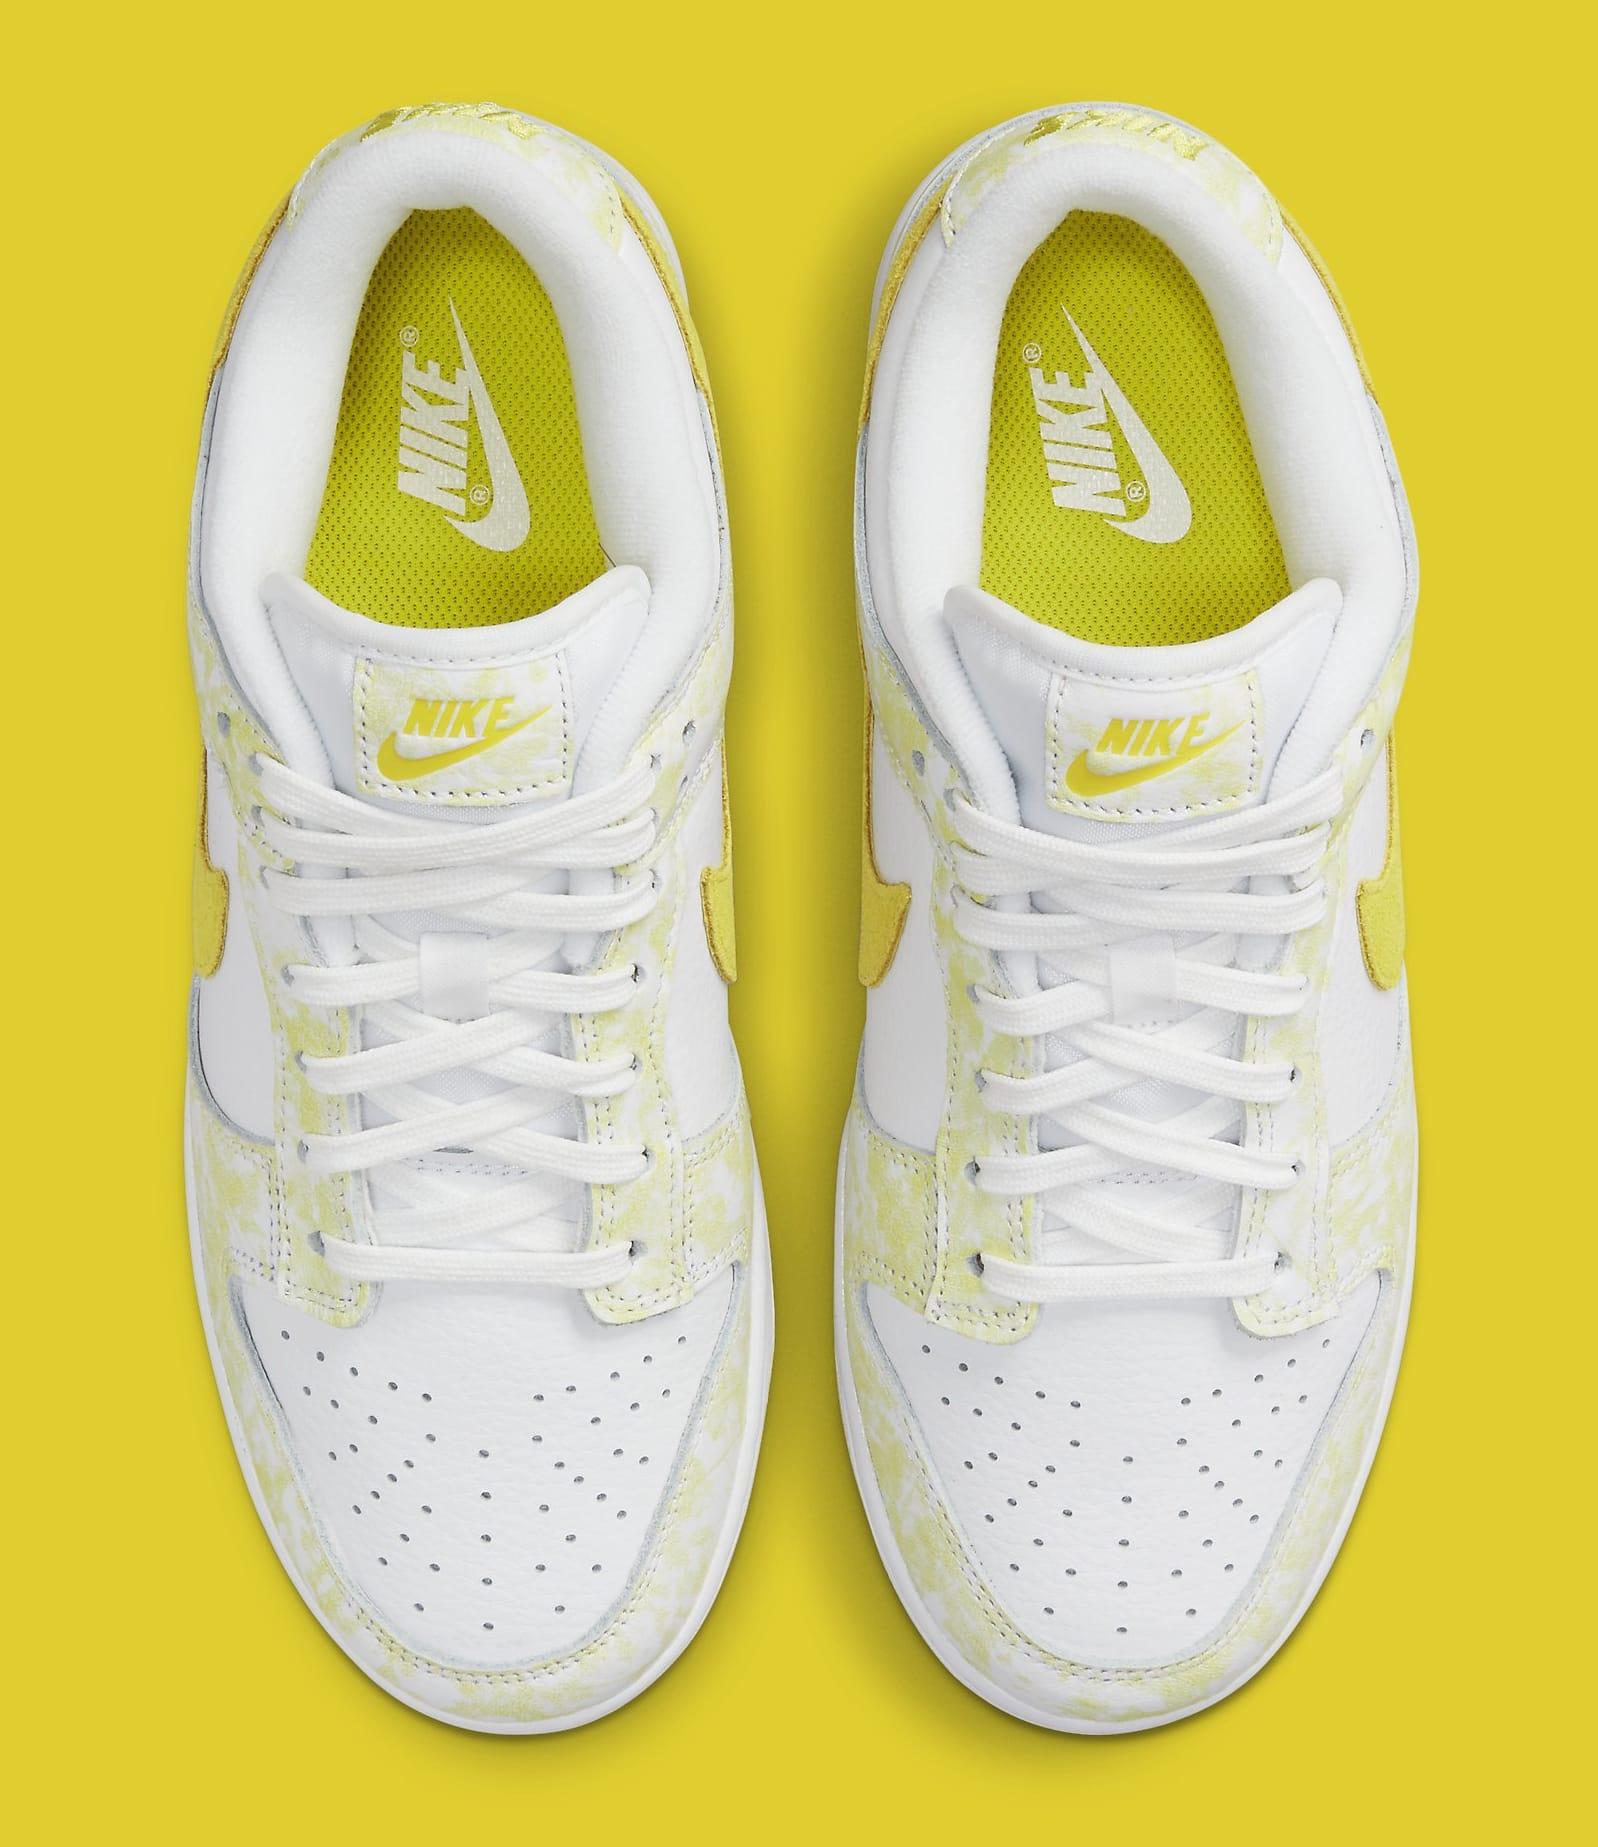 Nike Dunk Low 'Yellow Strike' DM9467-700 Top